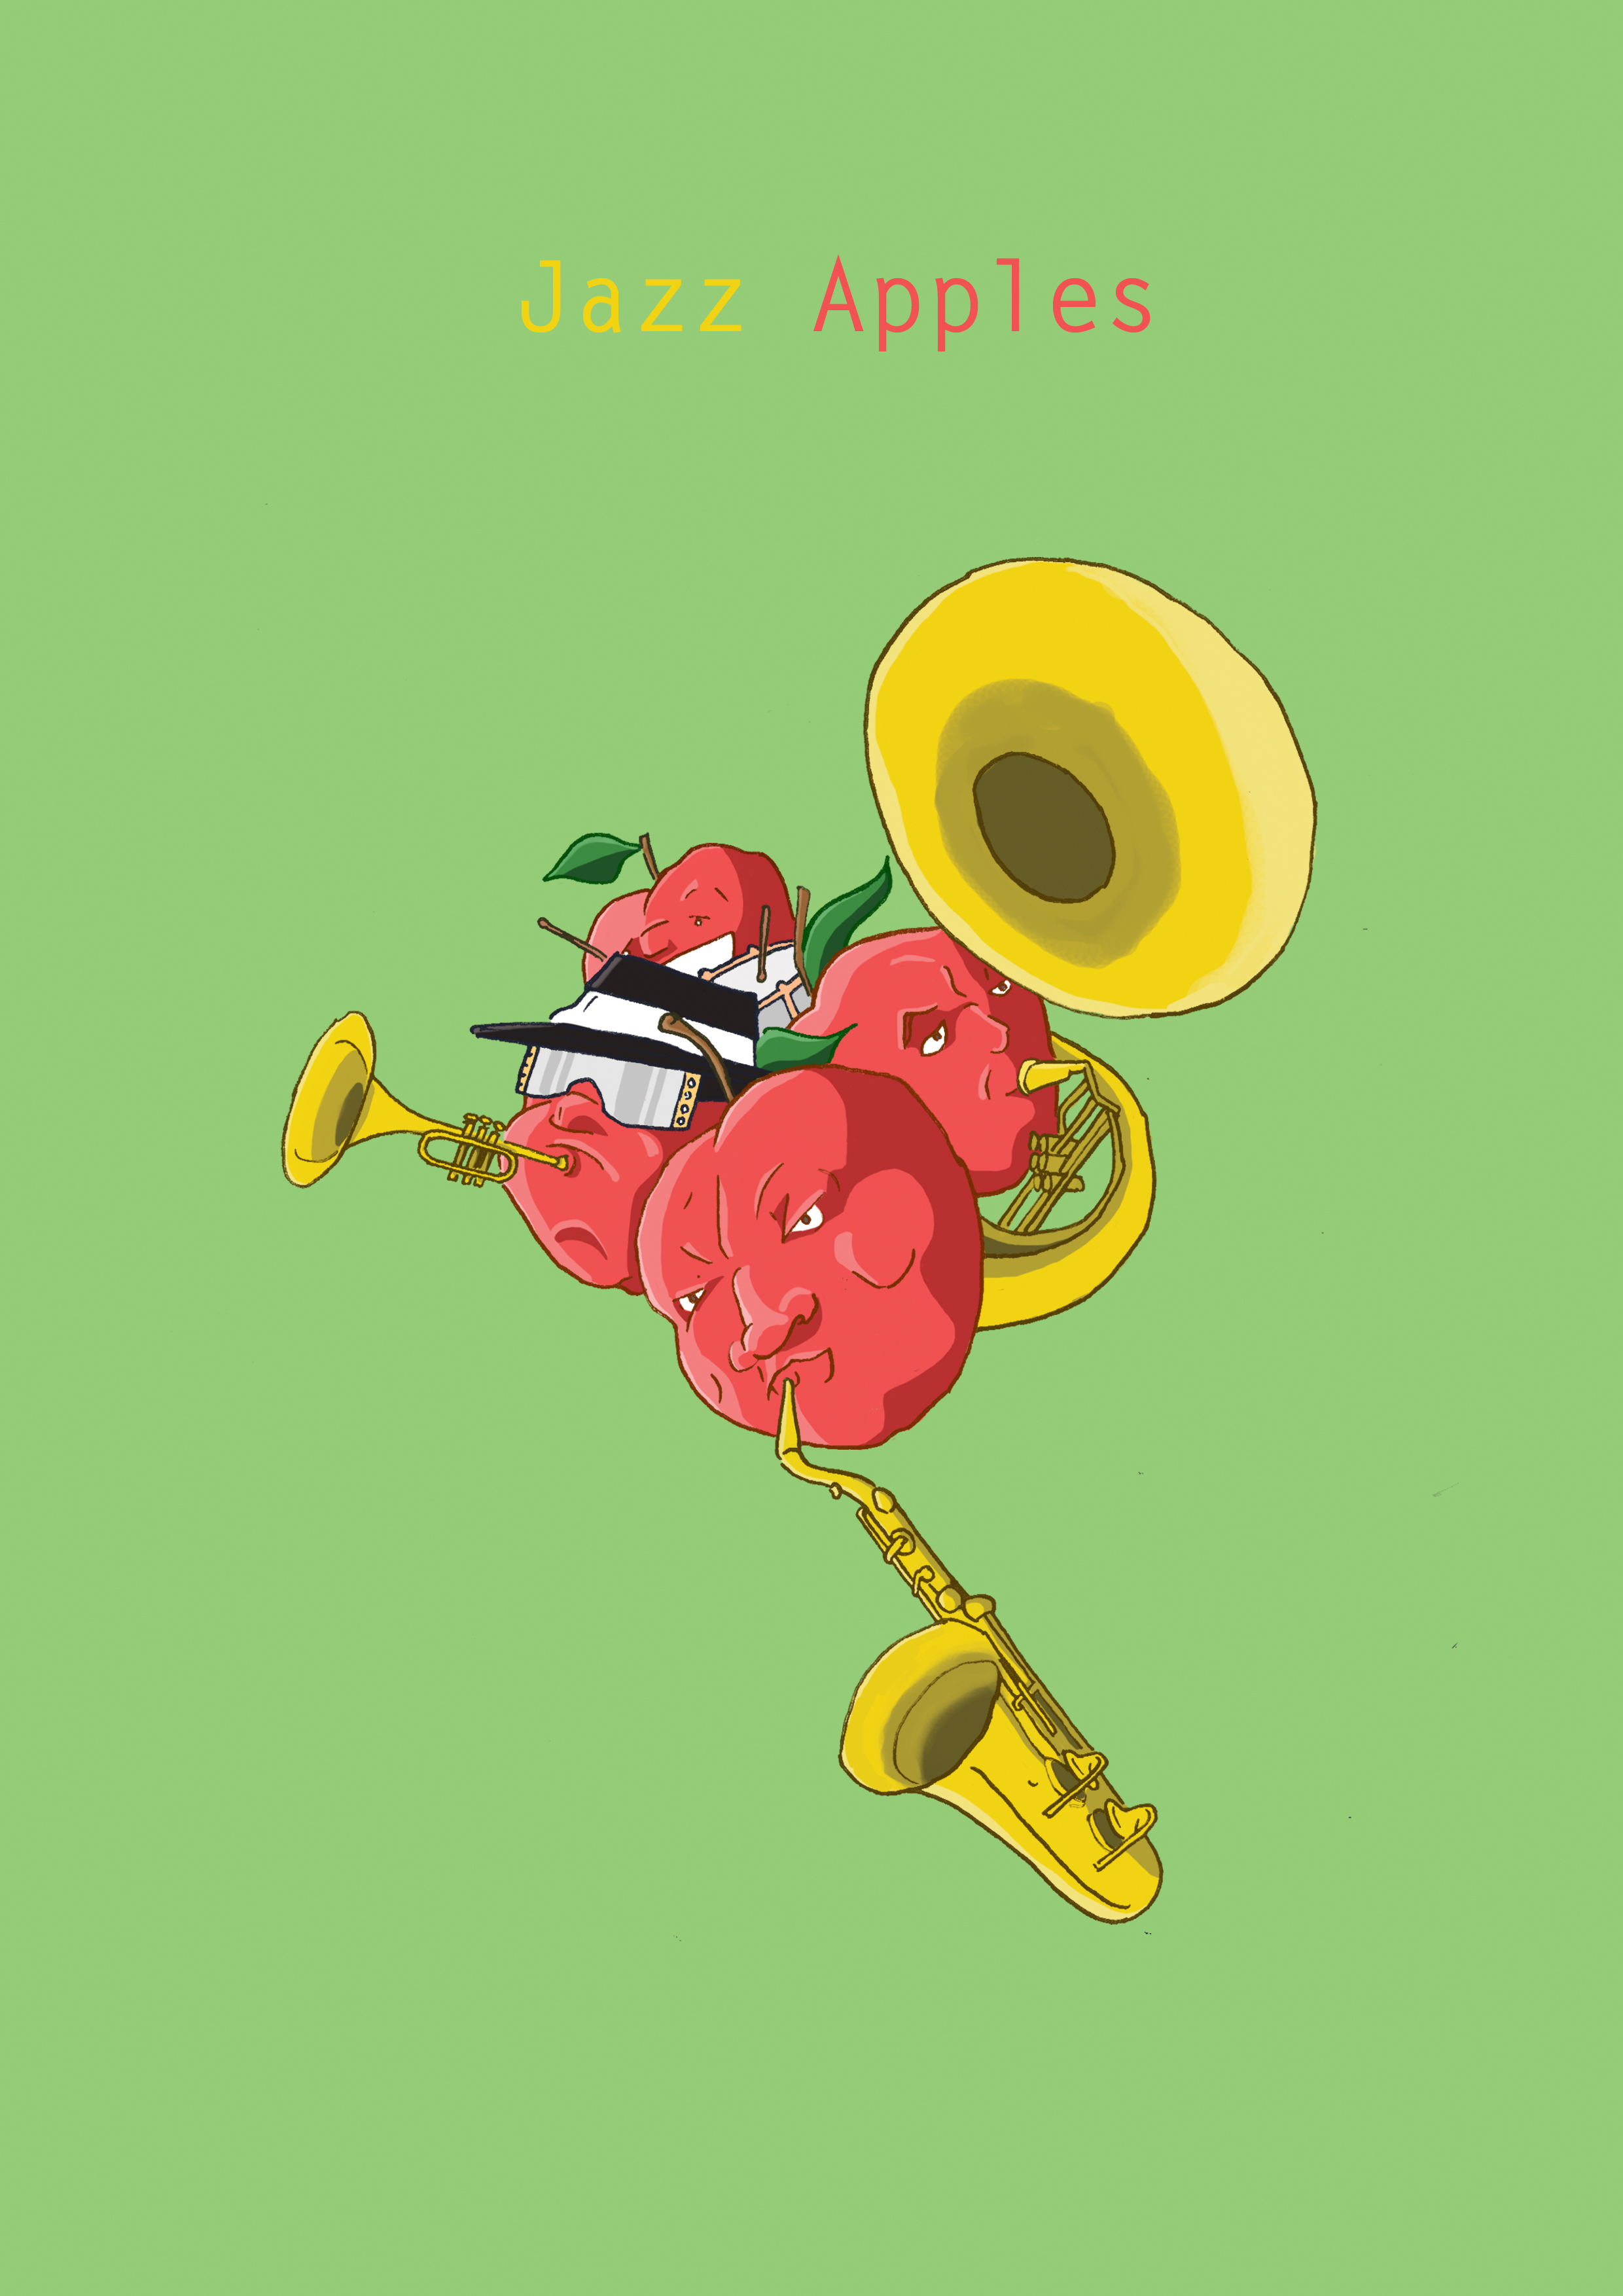 Jazz Apples A4 RGB v3.jpg